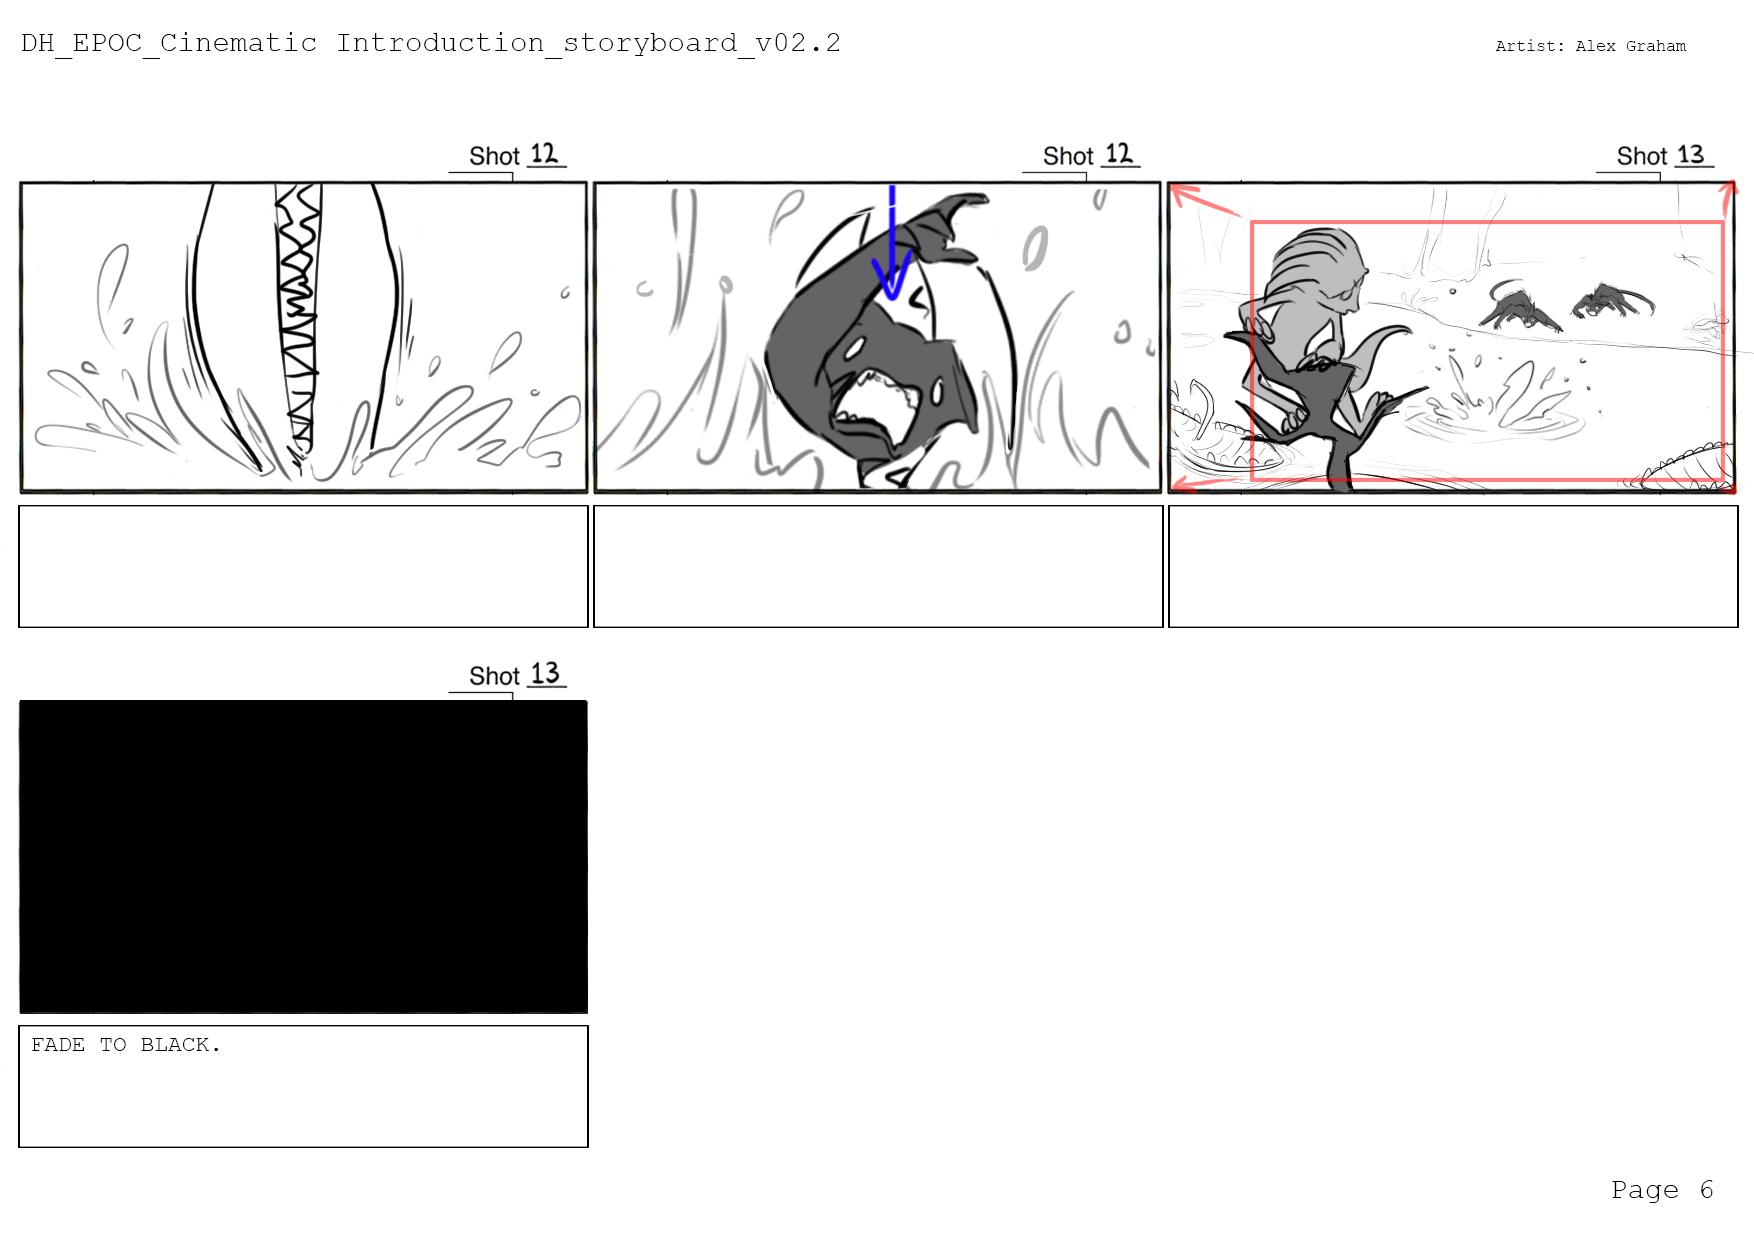 ABG_storyboard_07